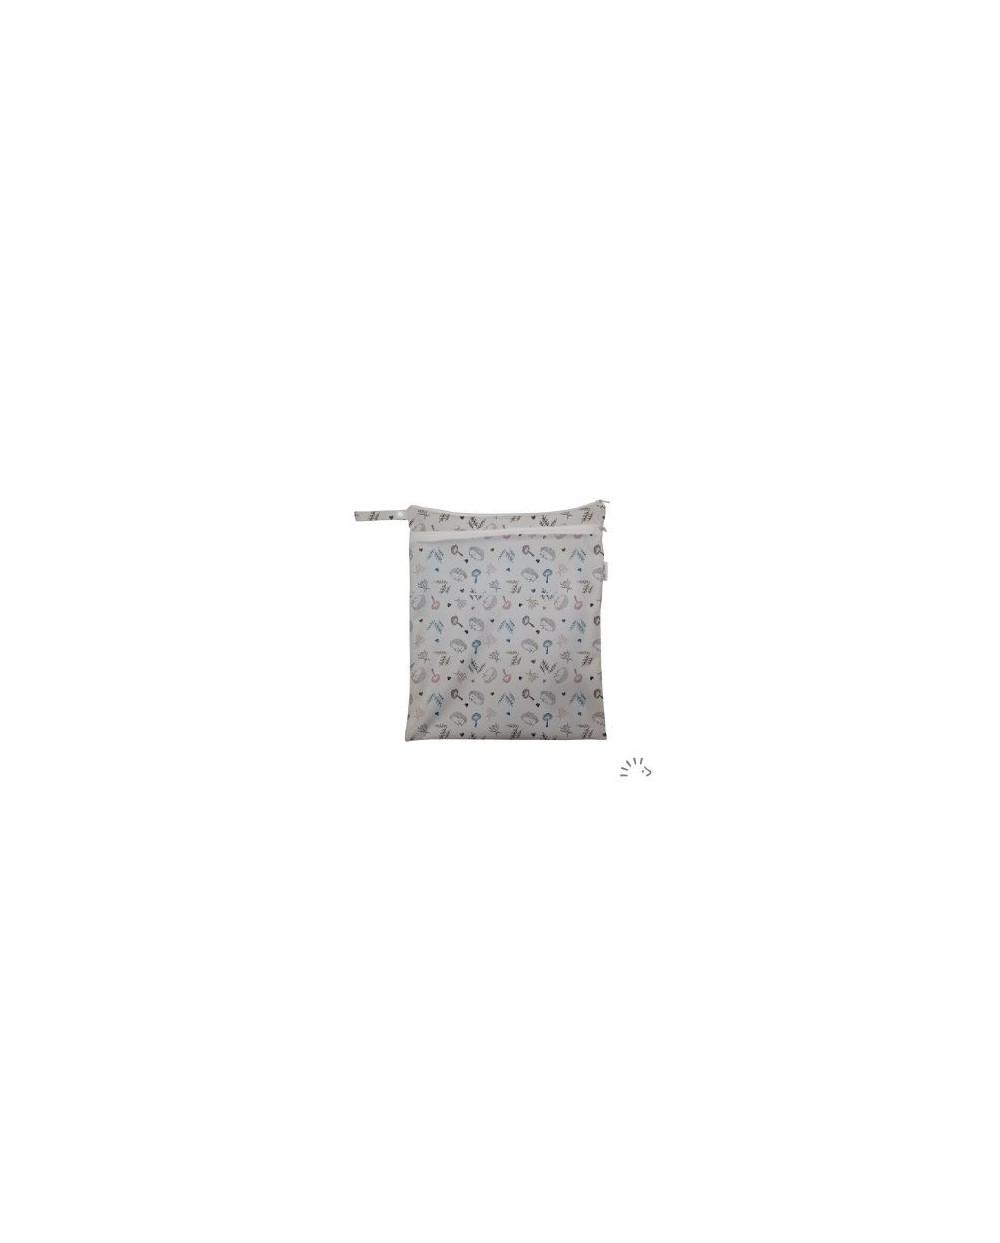 Popolini - Borsa Nappy zipper impermeabile pannolini e piscina woodland